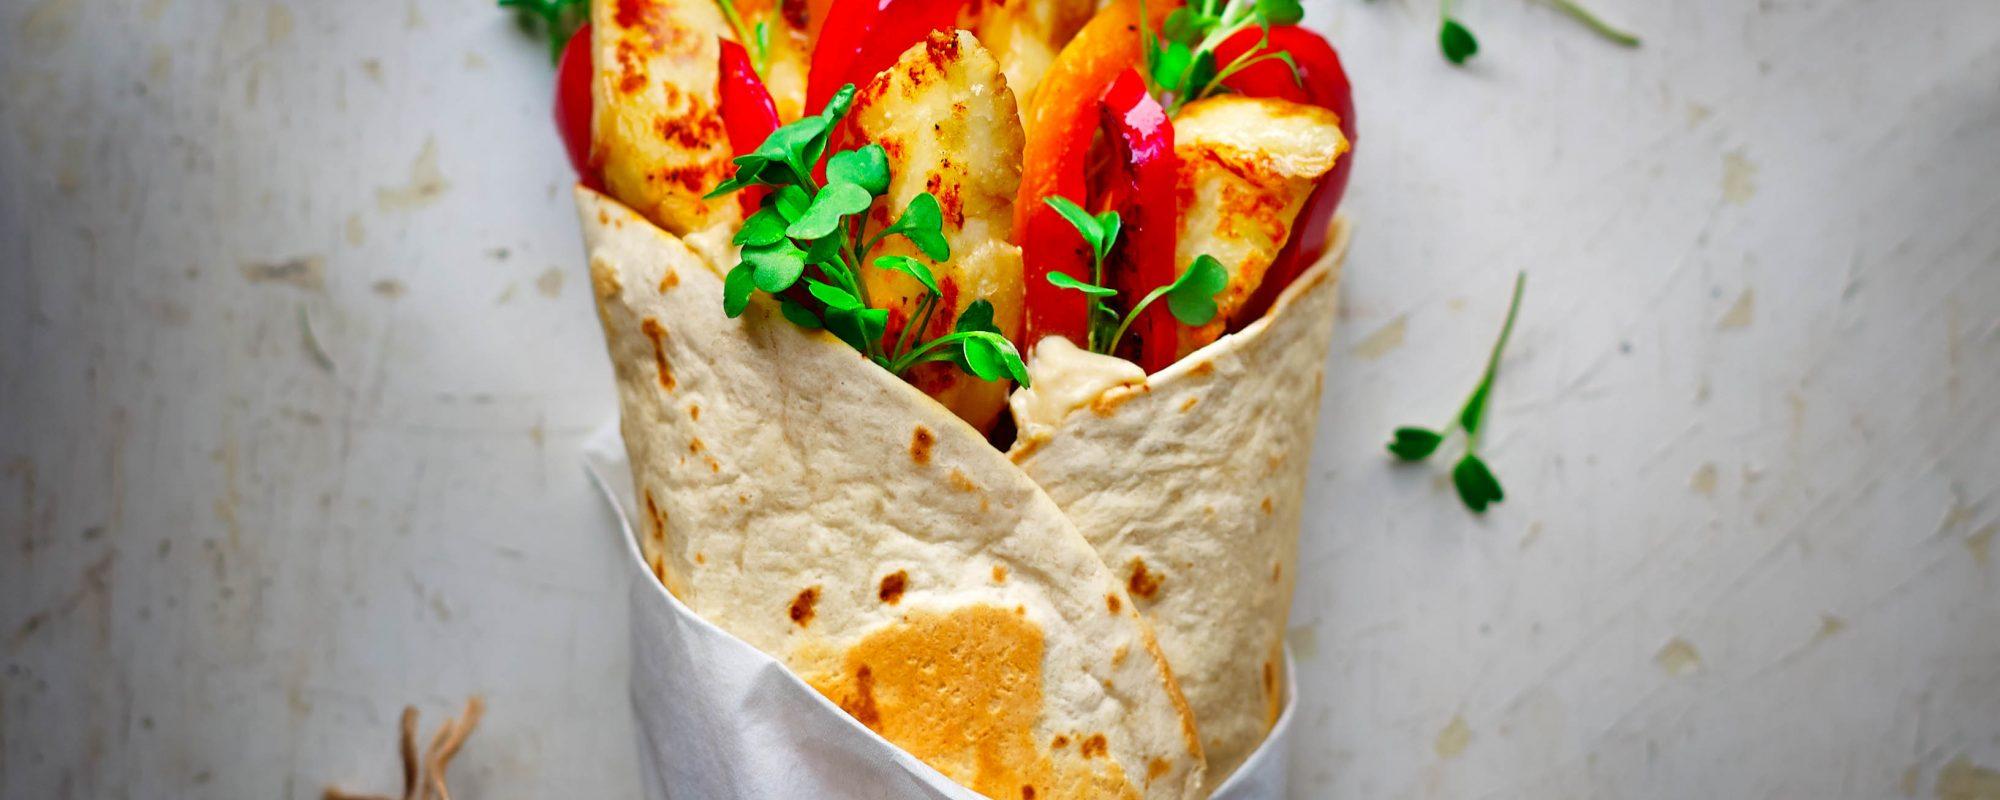 Halloumi wrap with salad cress